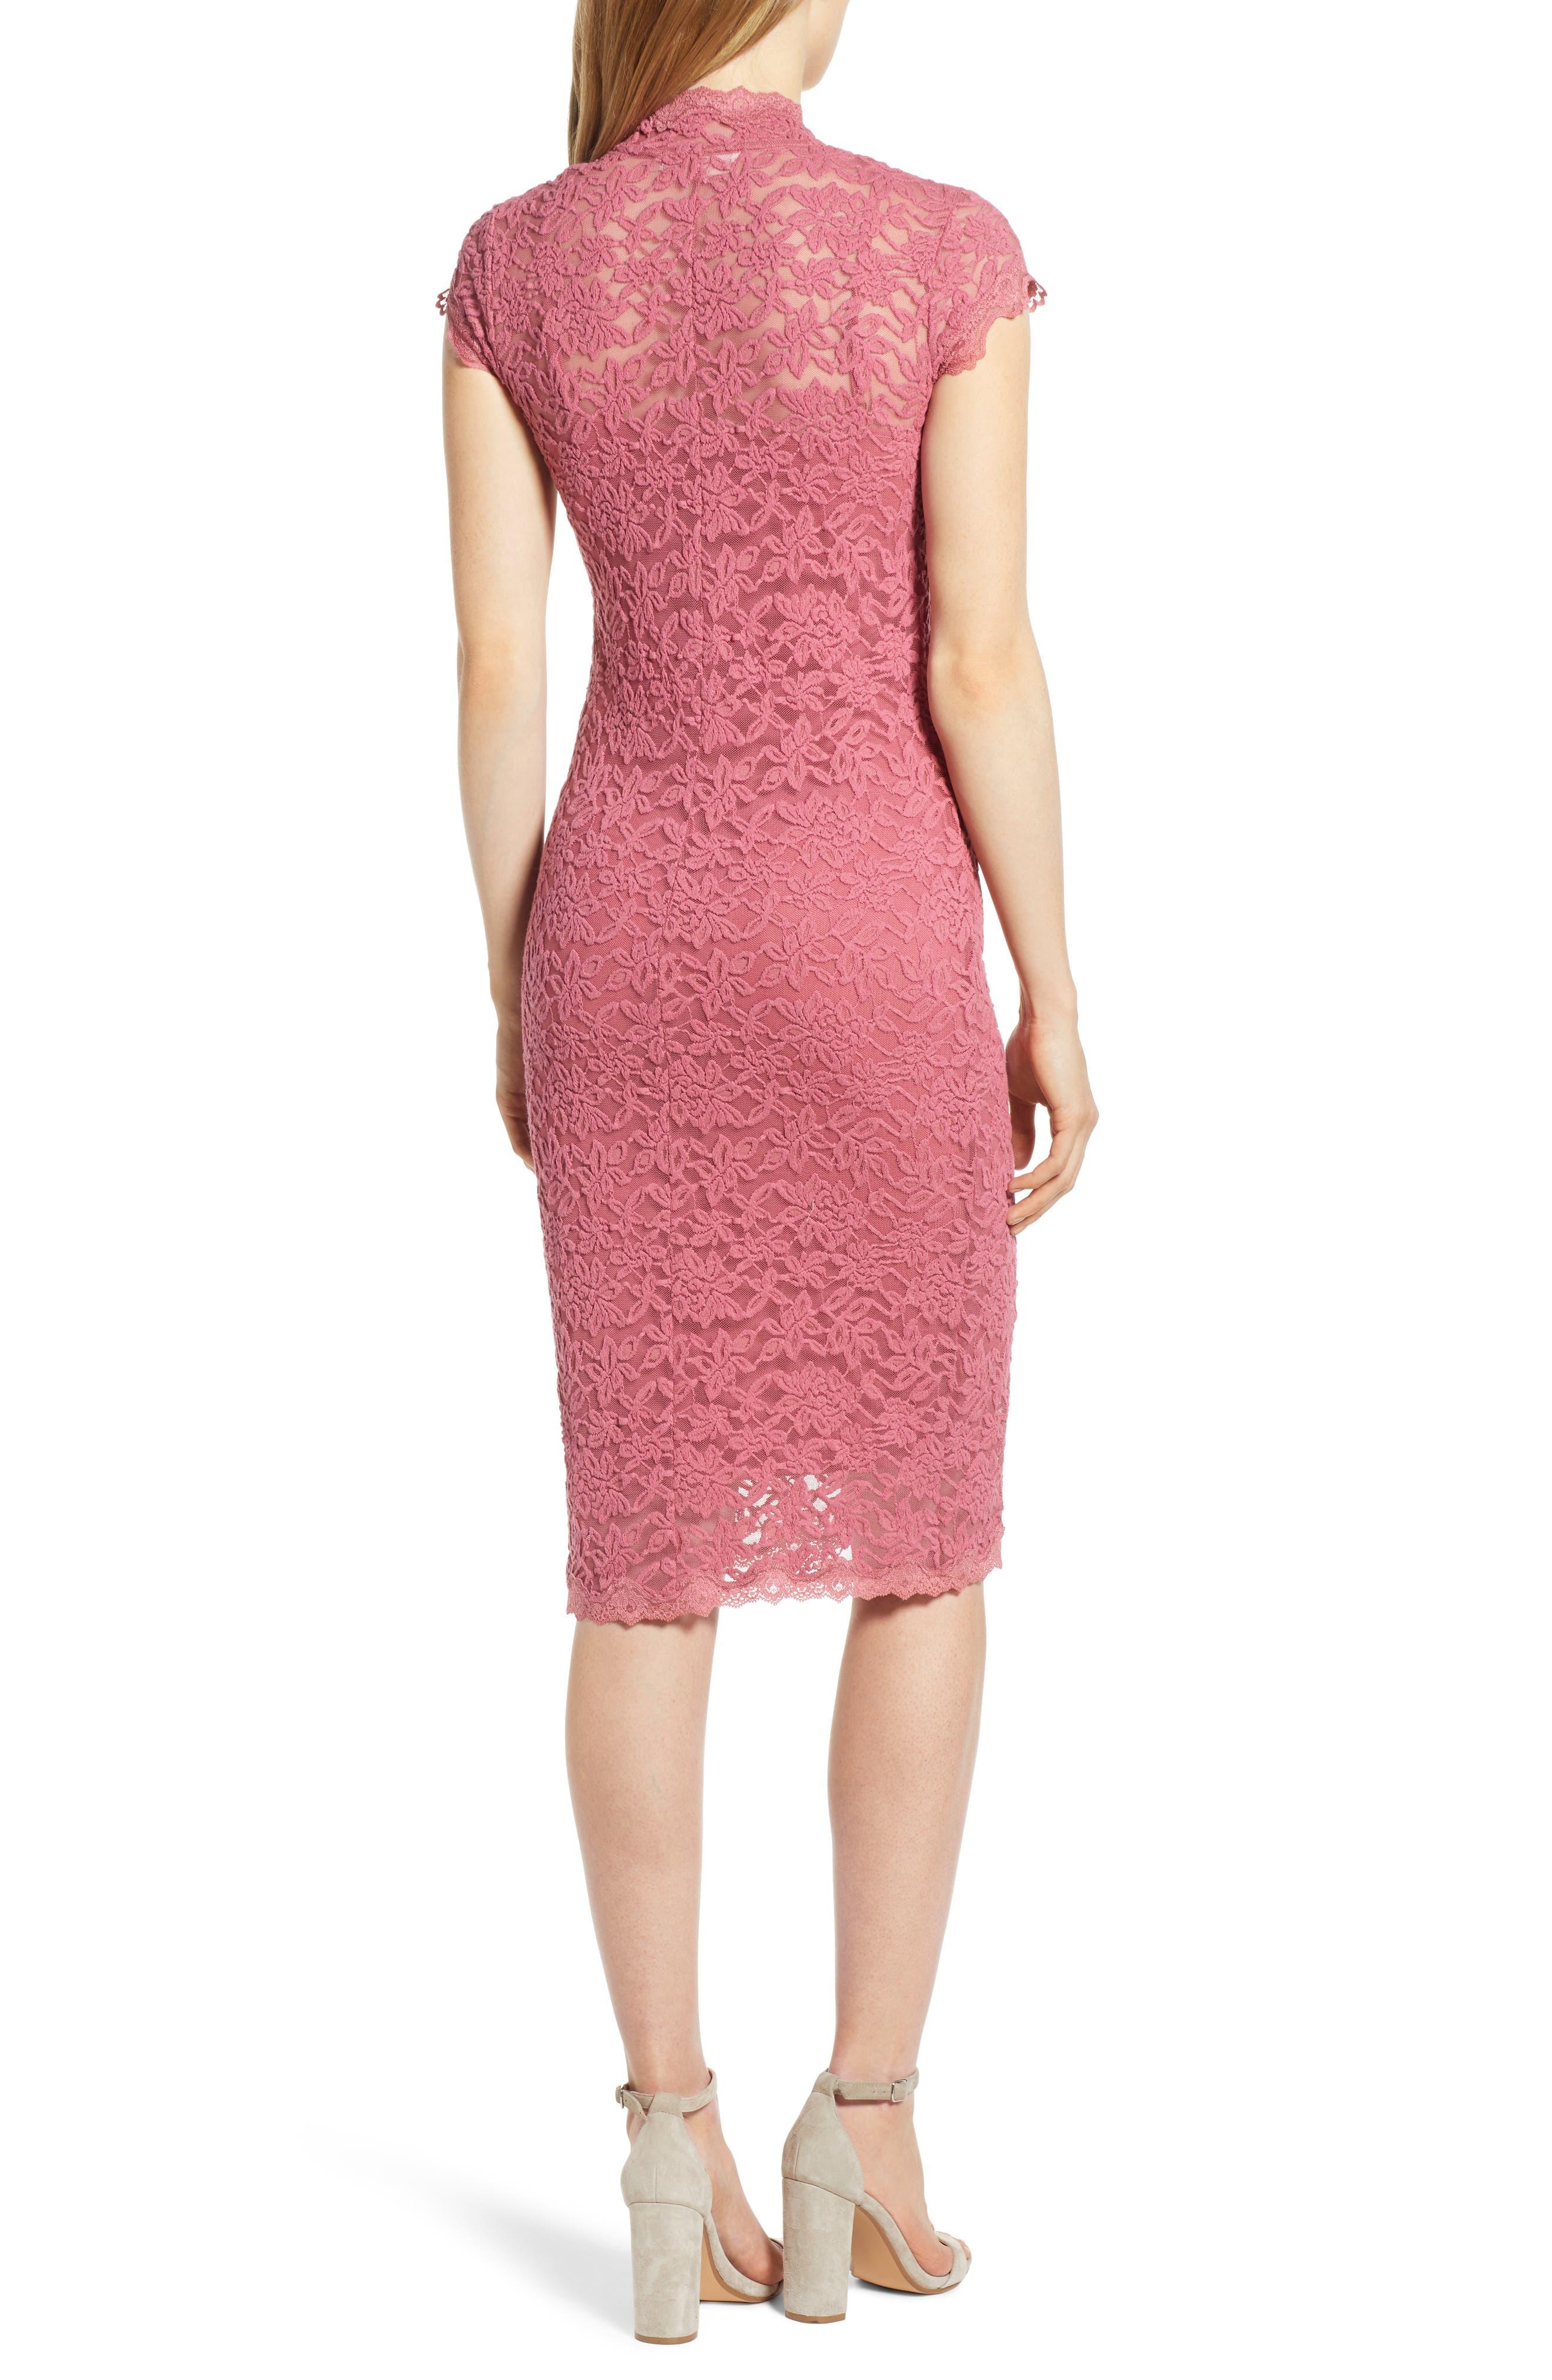 ROSEMUNDE, Delicia Lace Body-Con Dress, Alternate thumbnail 2, color, ROSEWINE 356